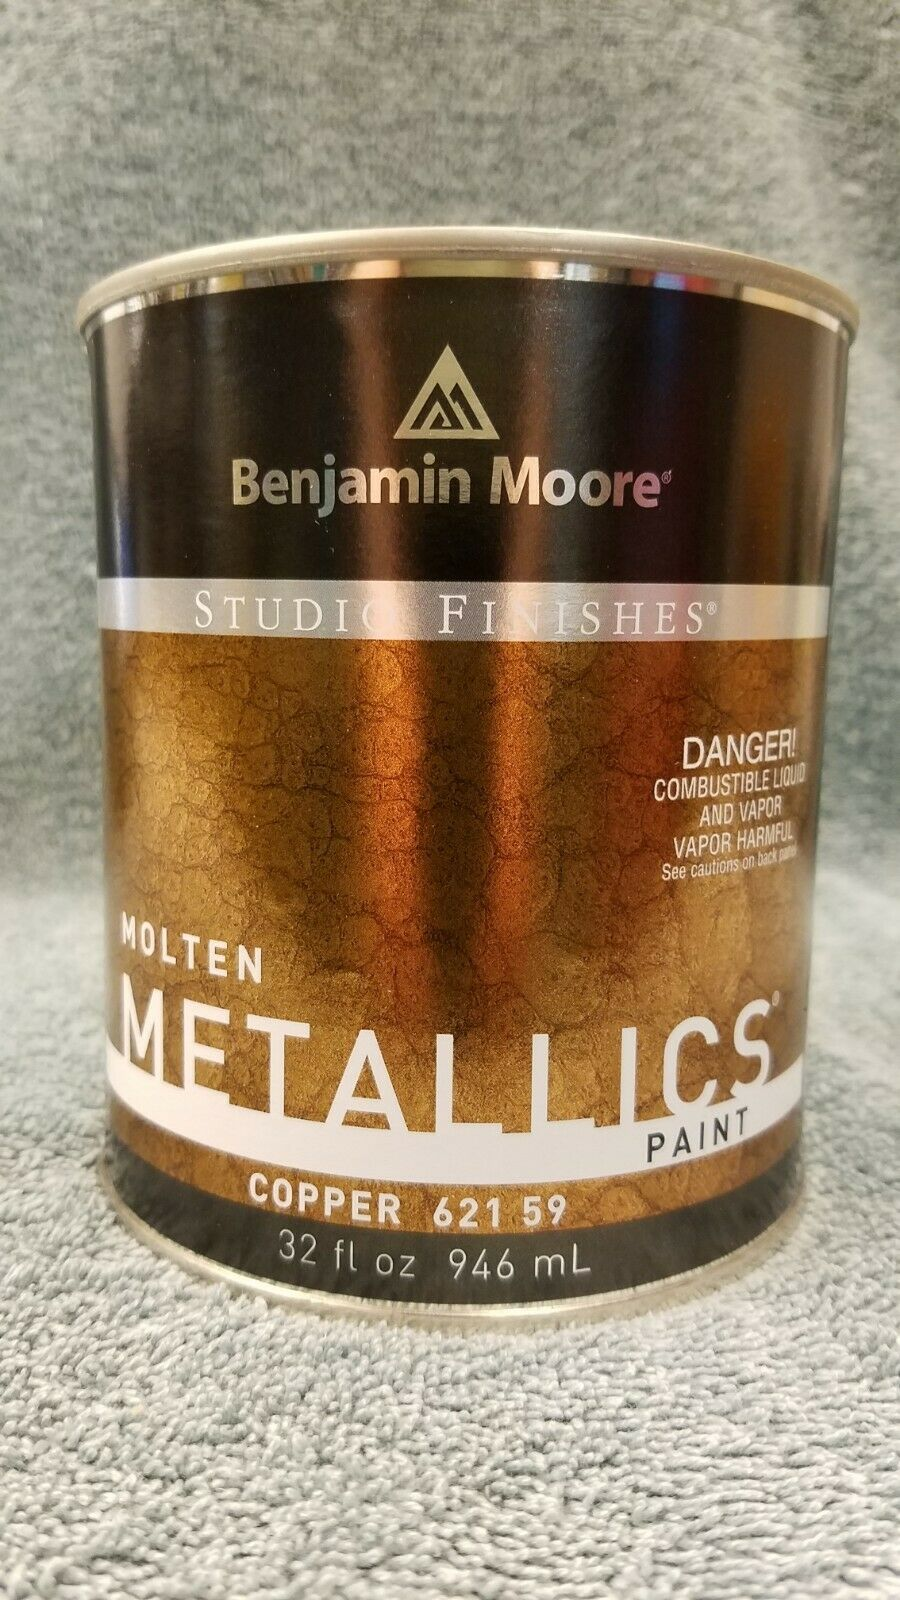 Studio Finishes Molten Metallics 621